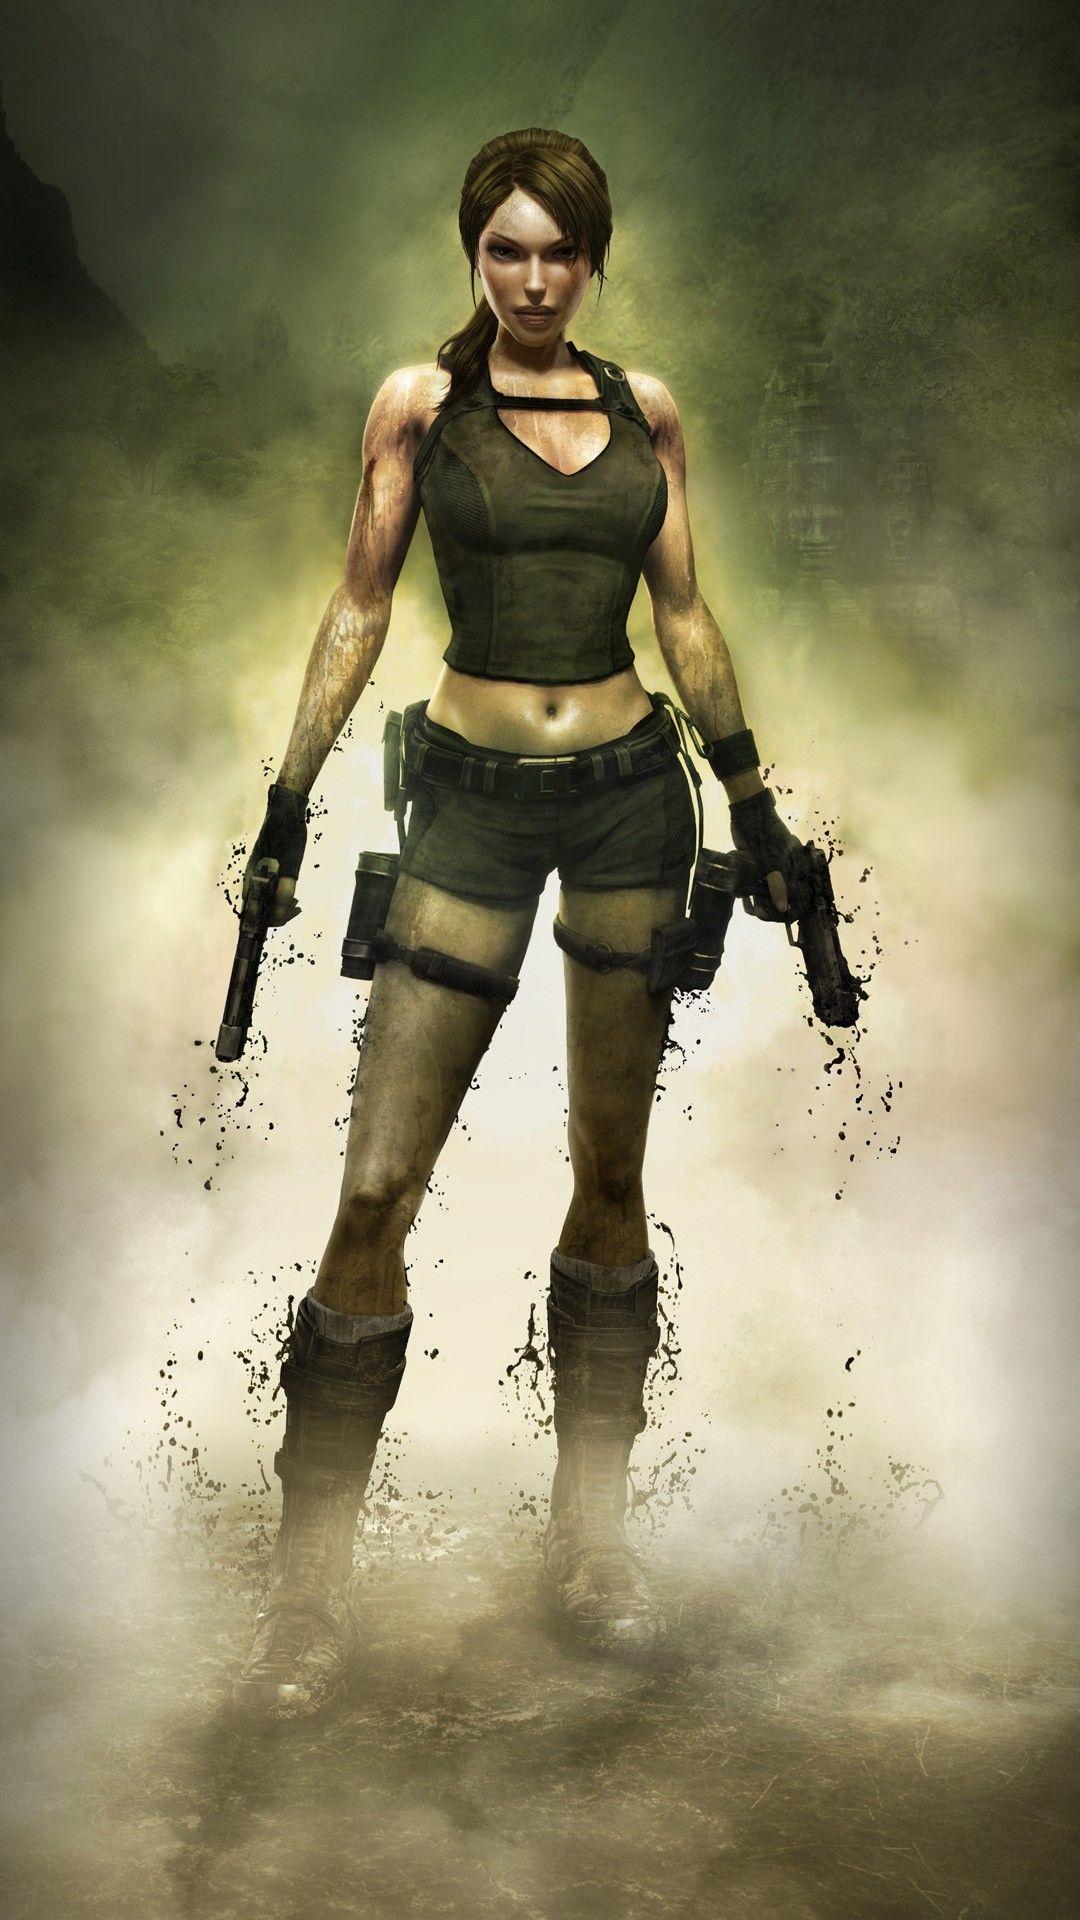 Lara Croft Tomb Raider Mobile Wallpaper Tomb Raider Underworld Tomb Raider Lara Croft Lara Croft Tomb